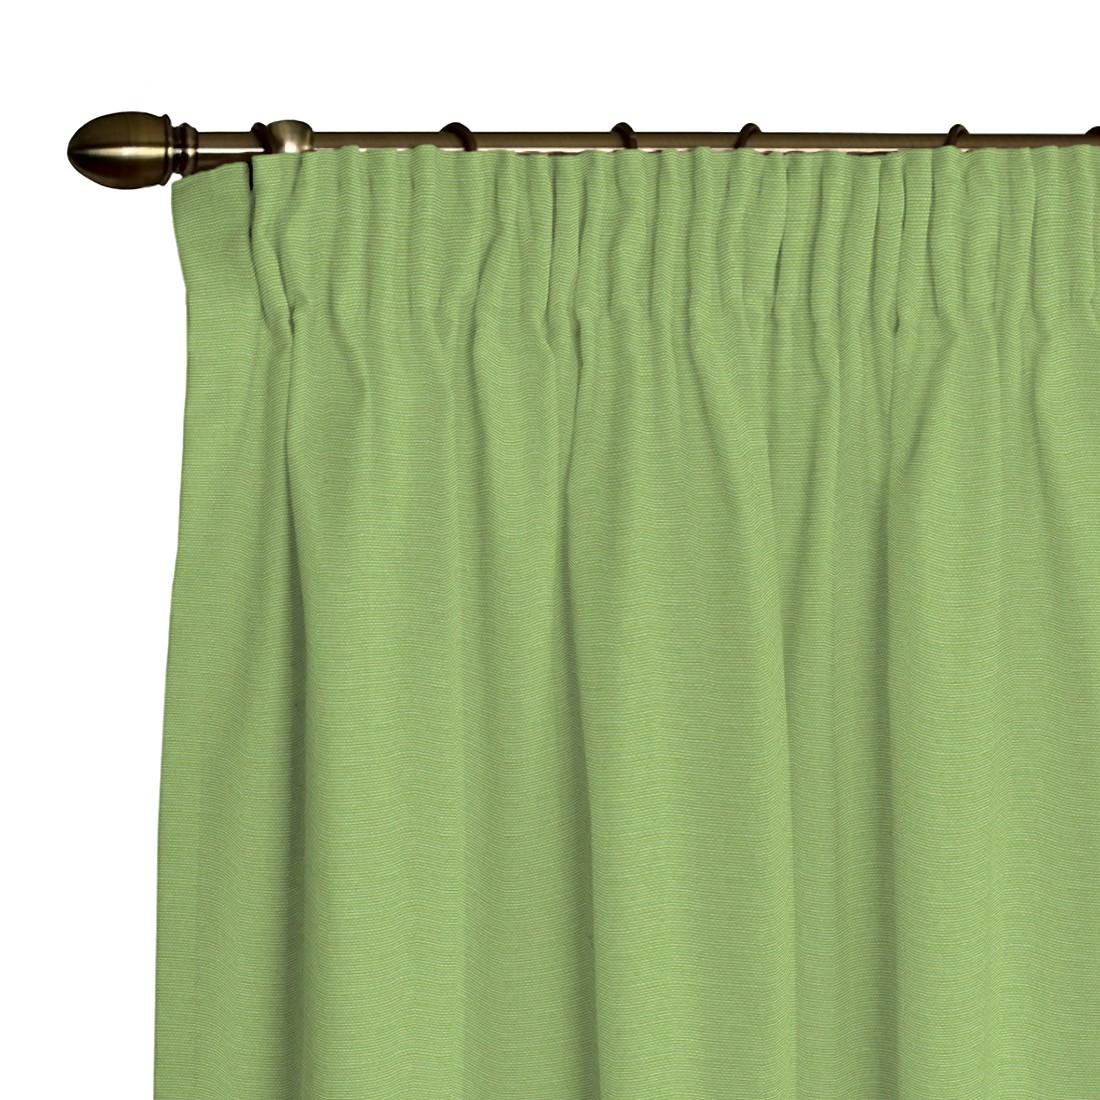 Vorhang Atago (inkl. Kräuselband) – Hellgrün – 130 x 260 cm, Dekoria bestellen